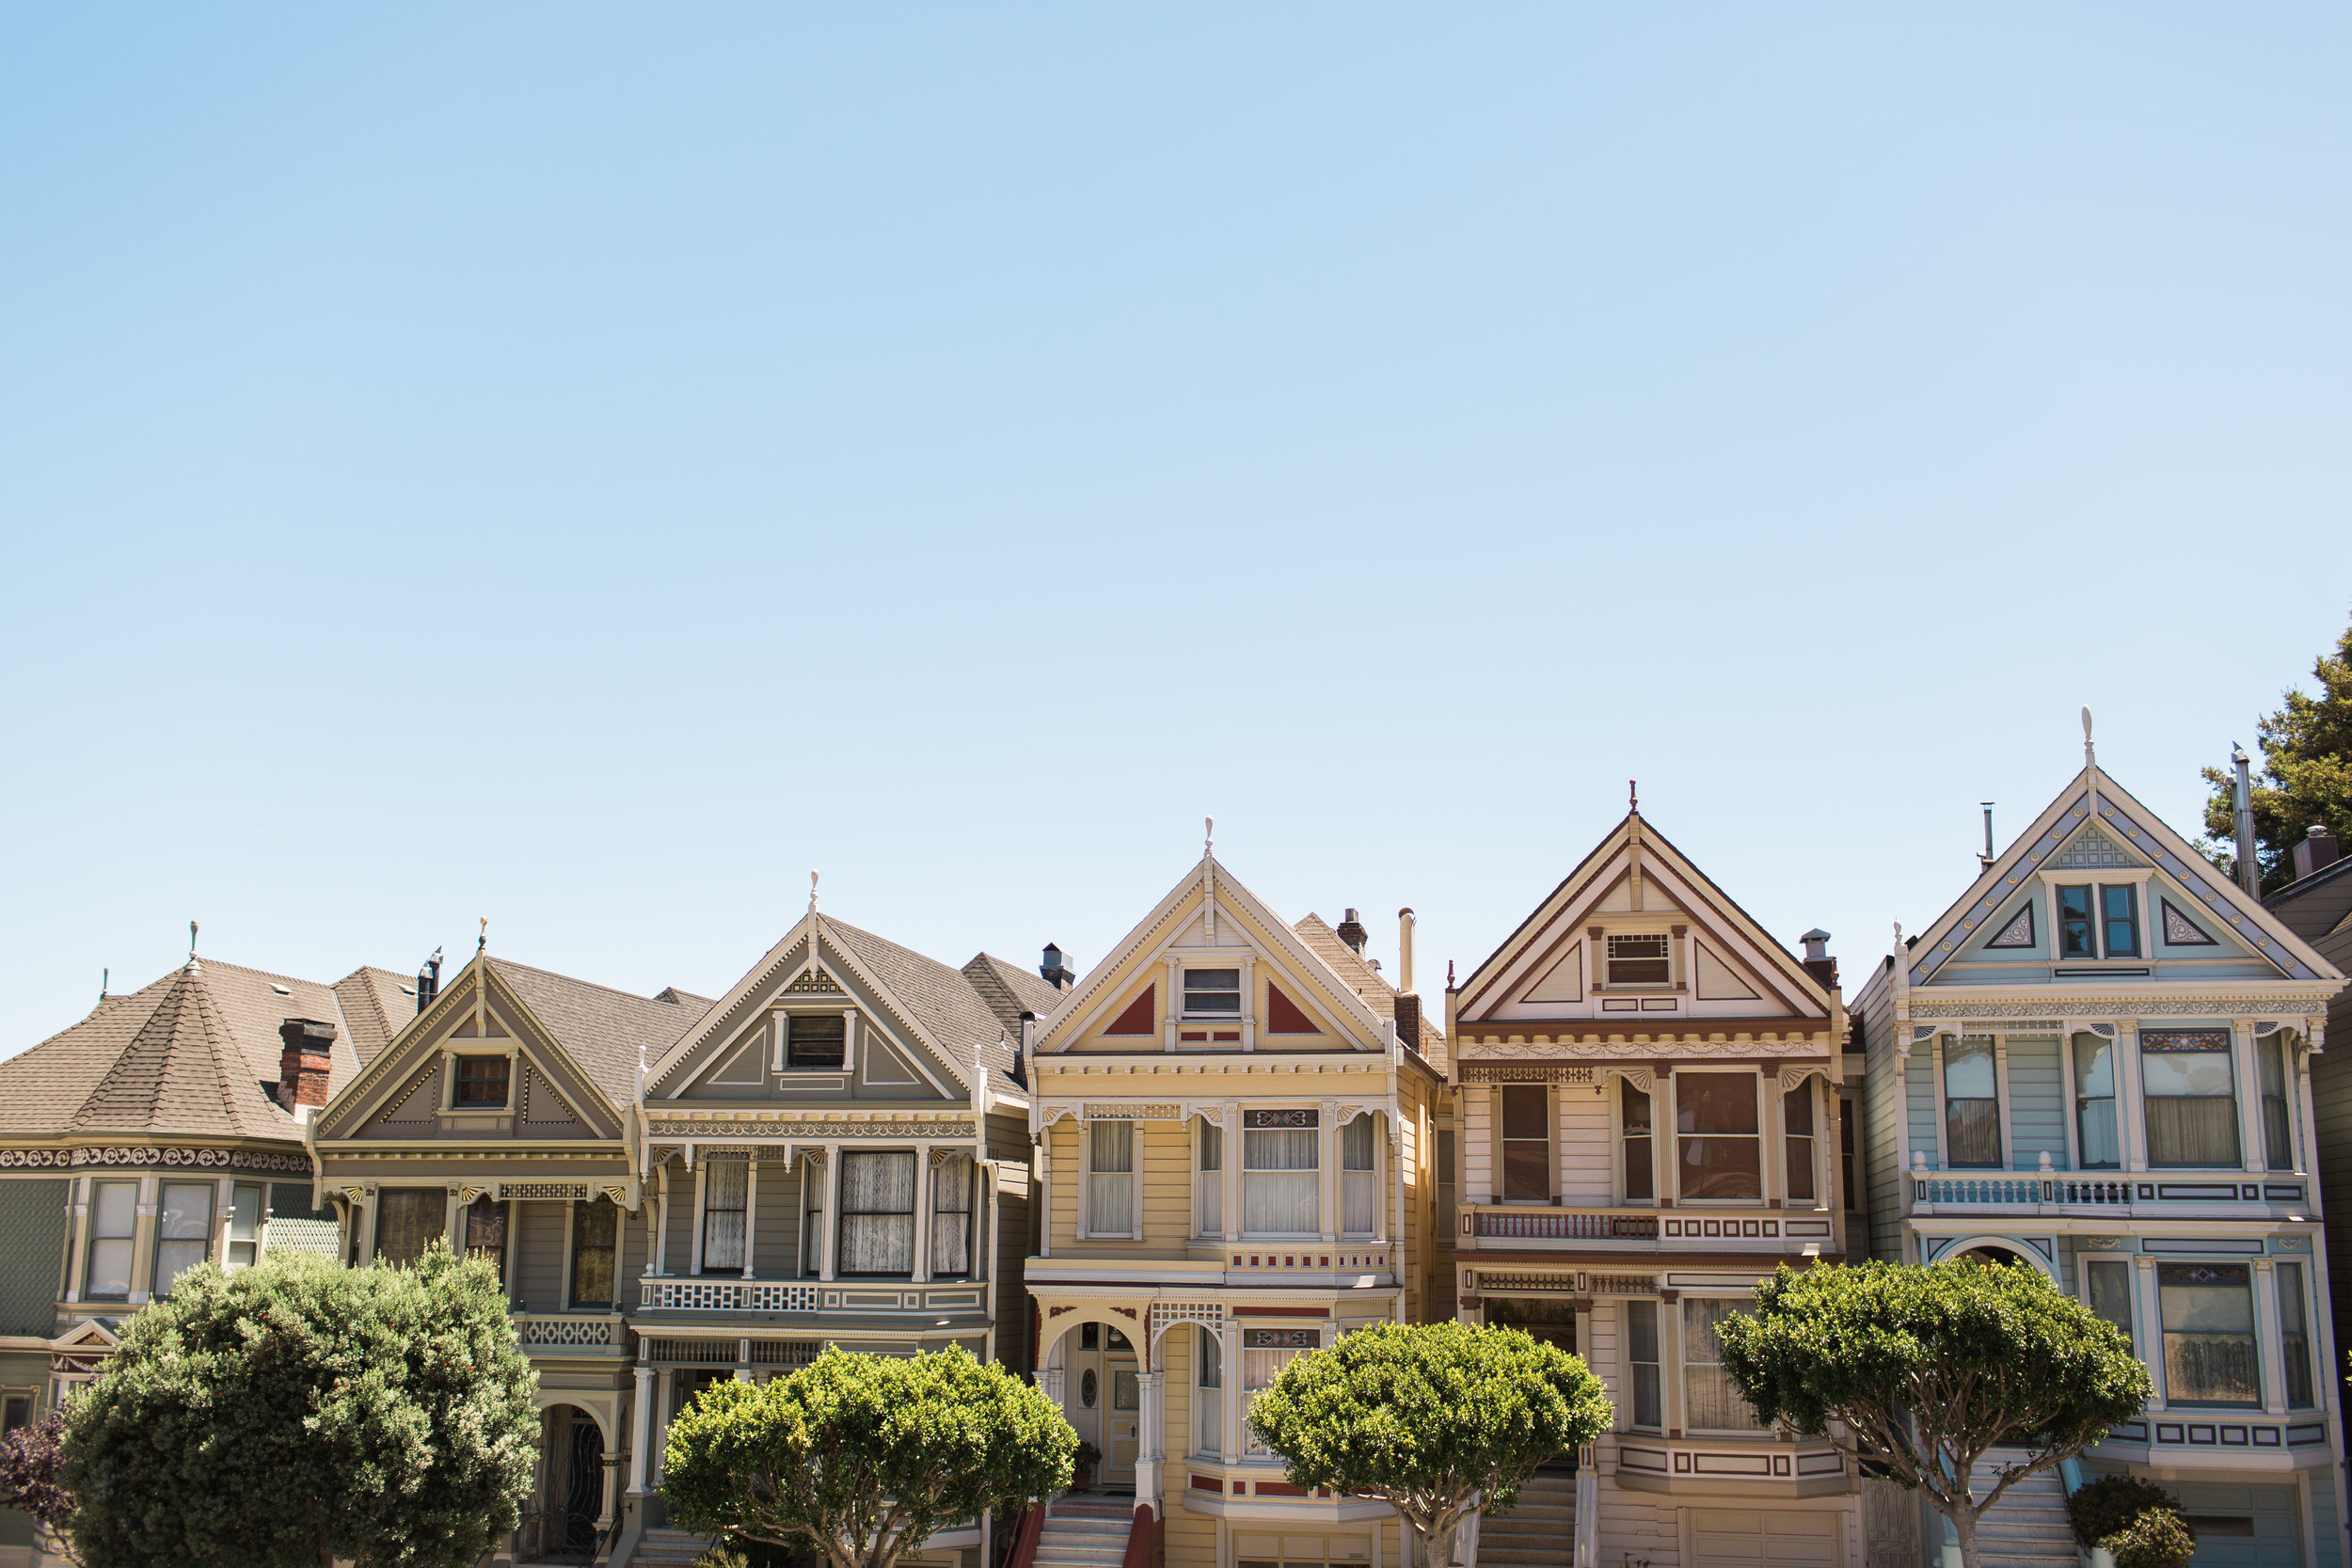 Wanderlust California: San Francisco Painted Ladies